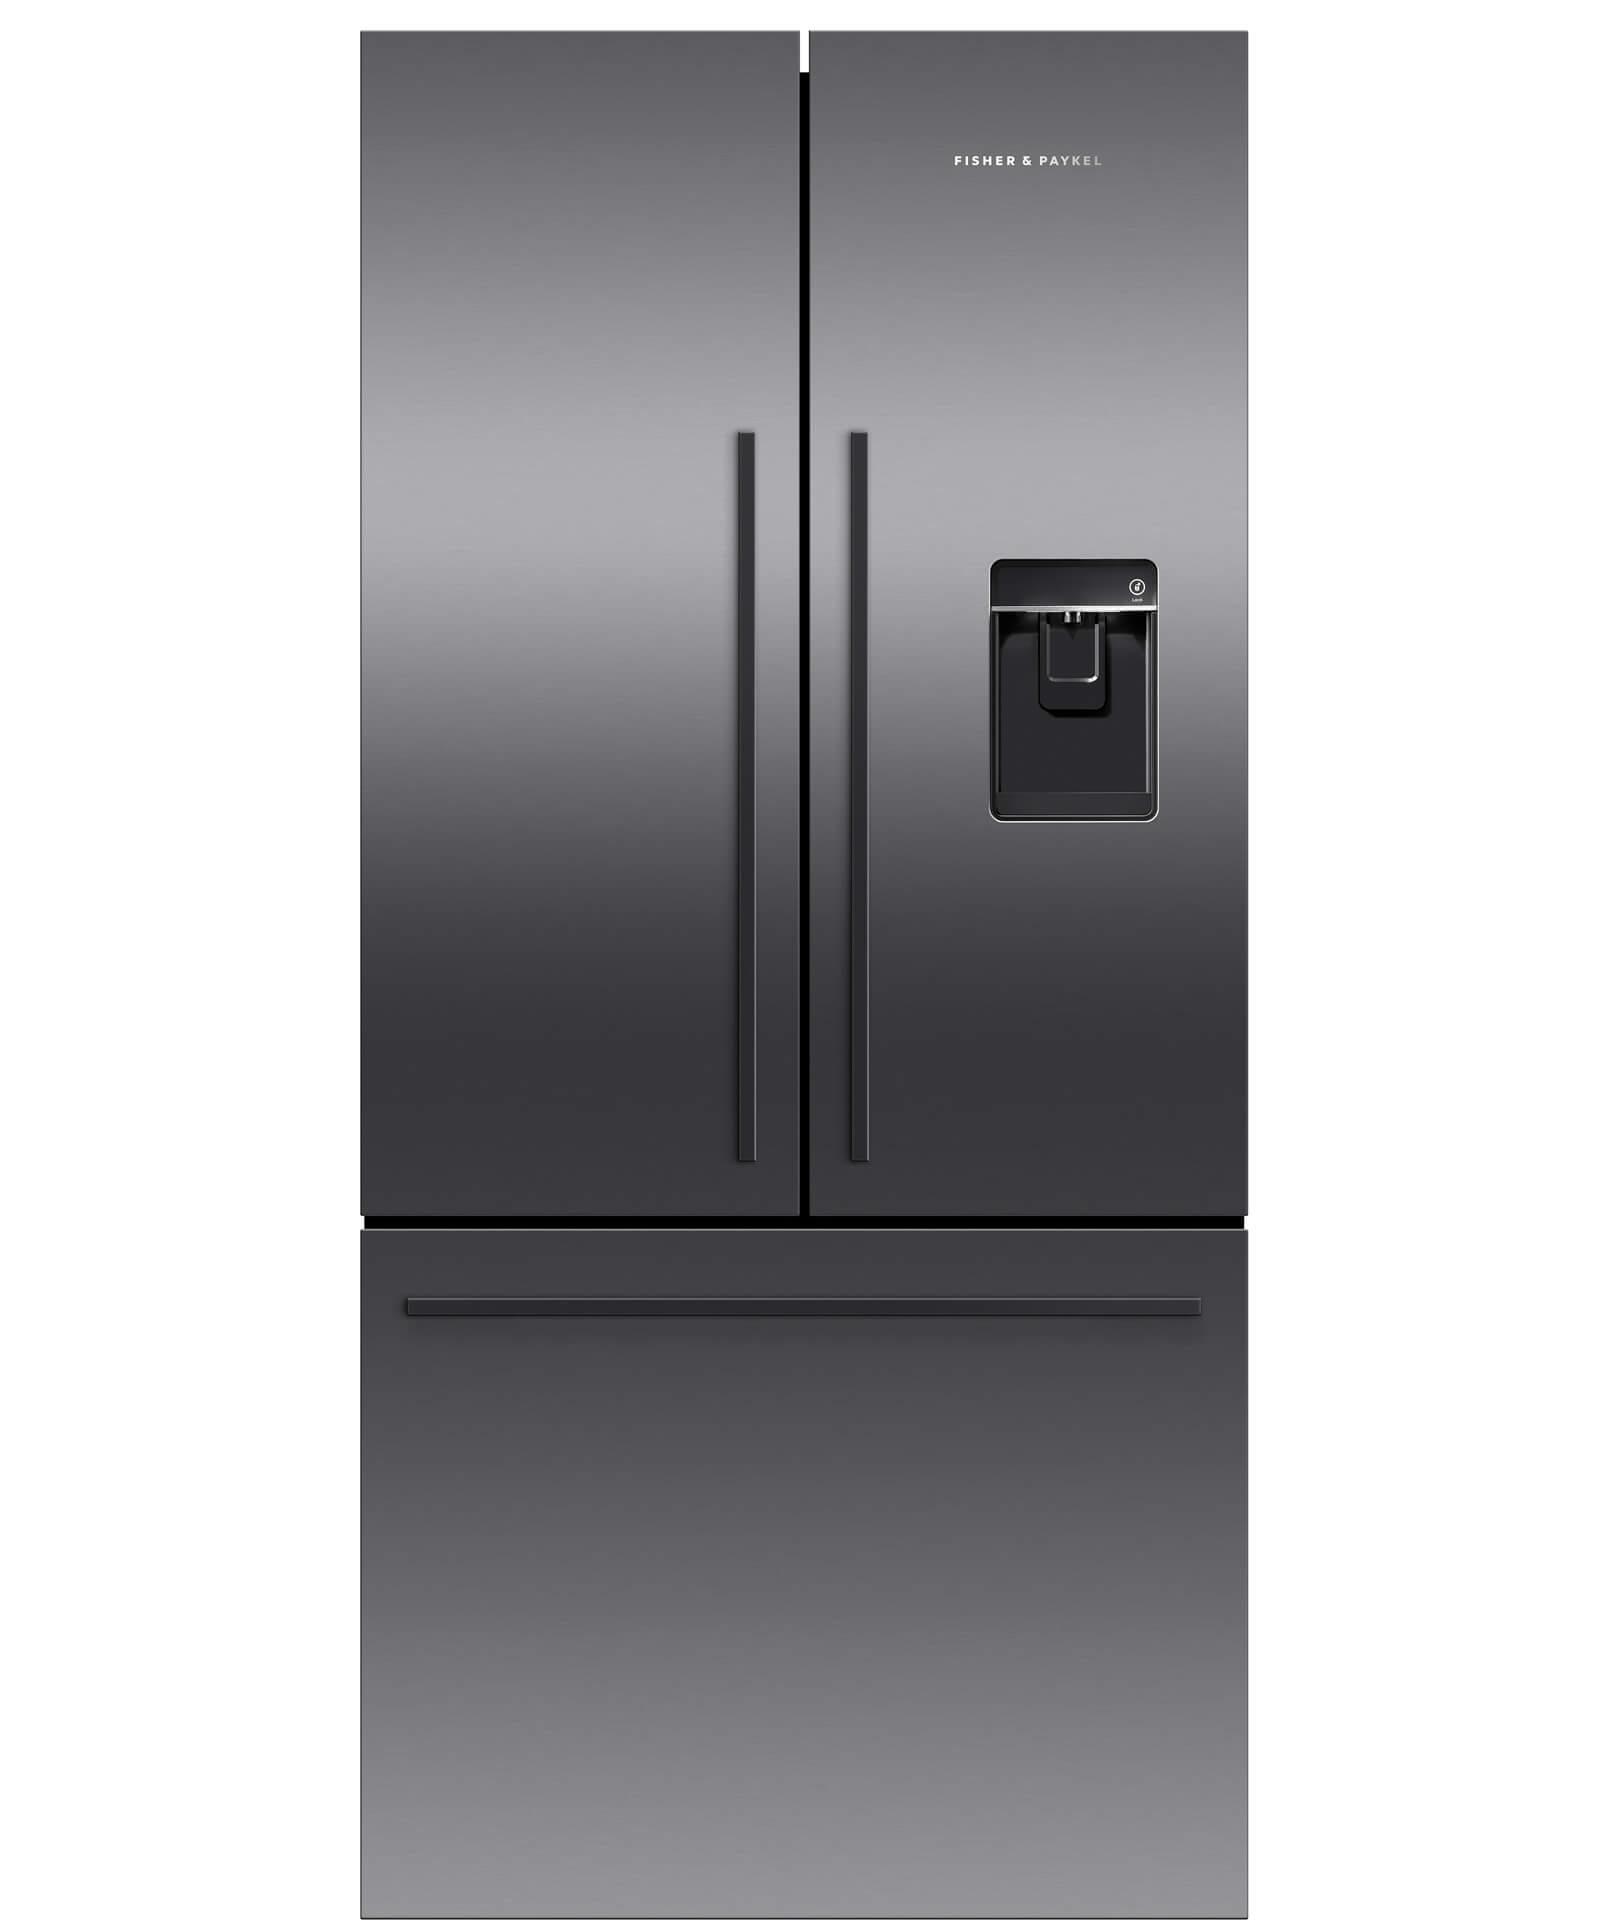 RF170ADUSB5 - Black French Door Fridge, 17 cu ft, Ice & Water ... on